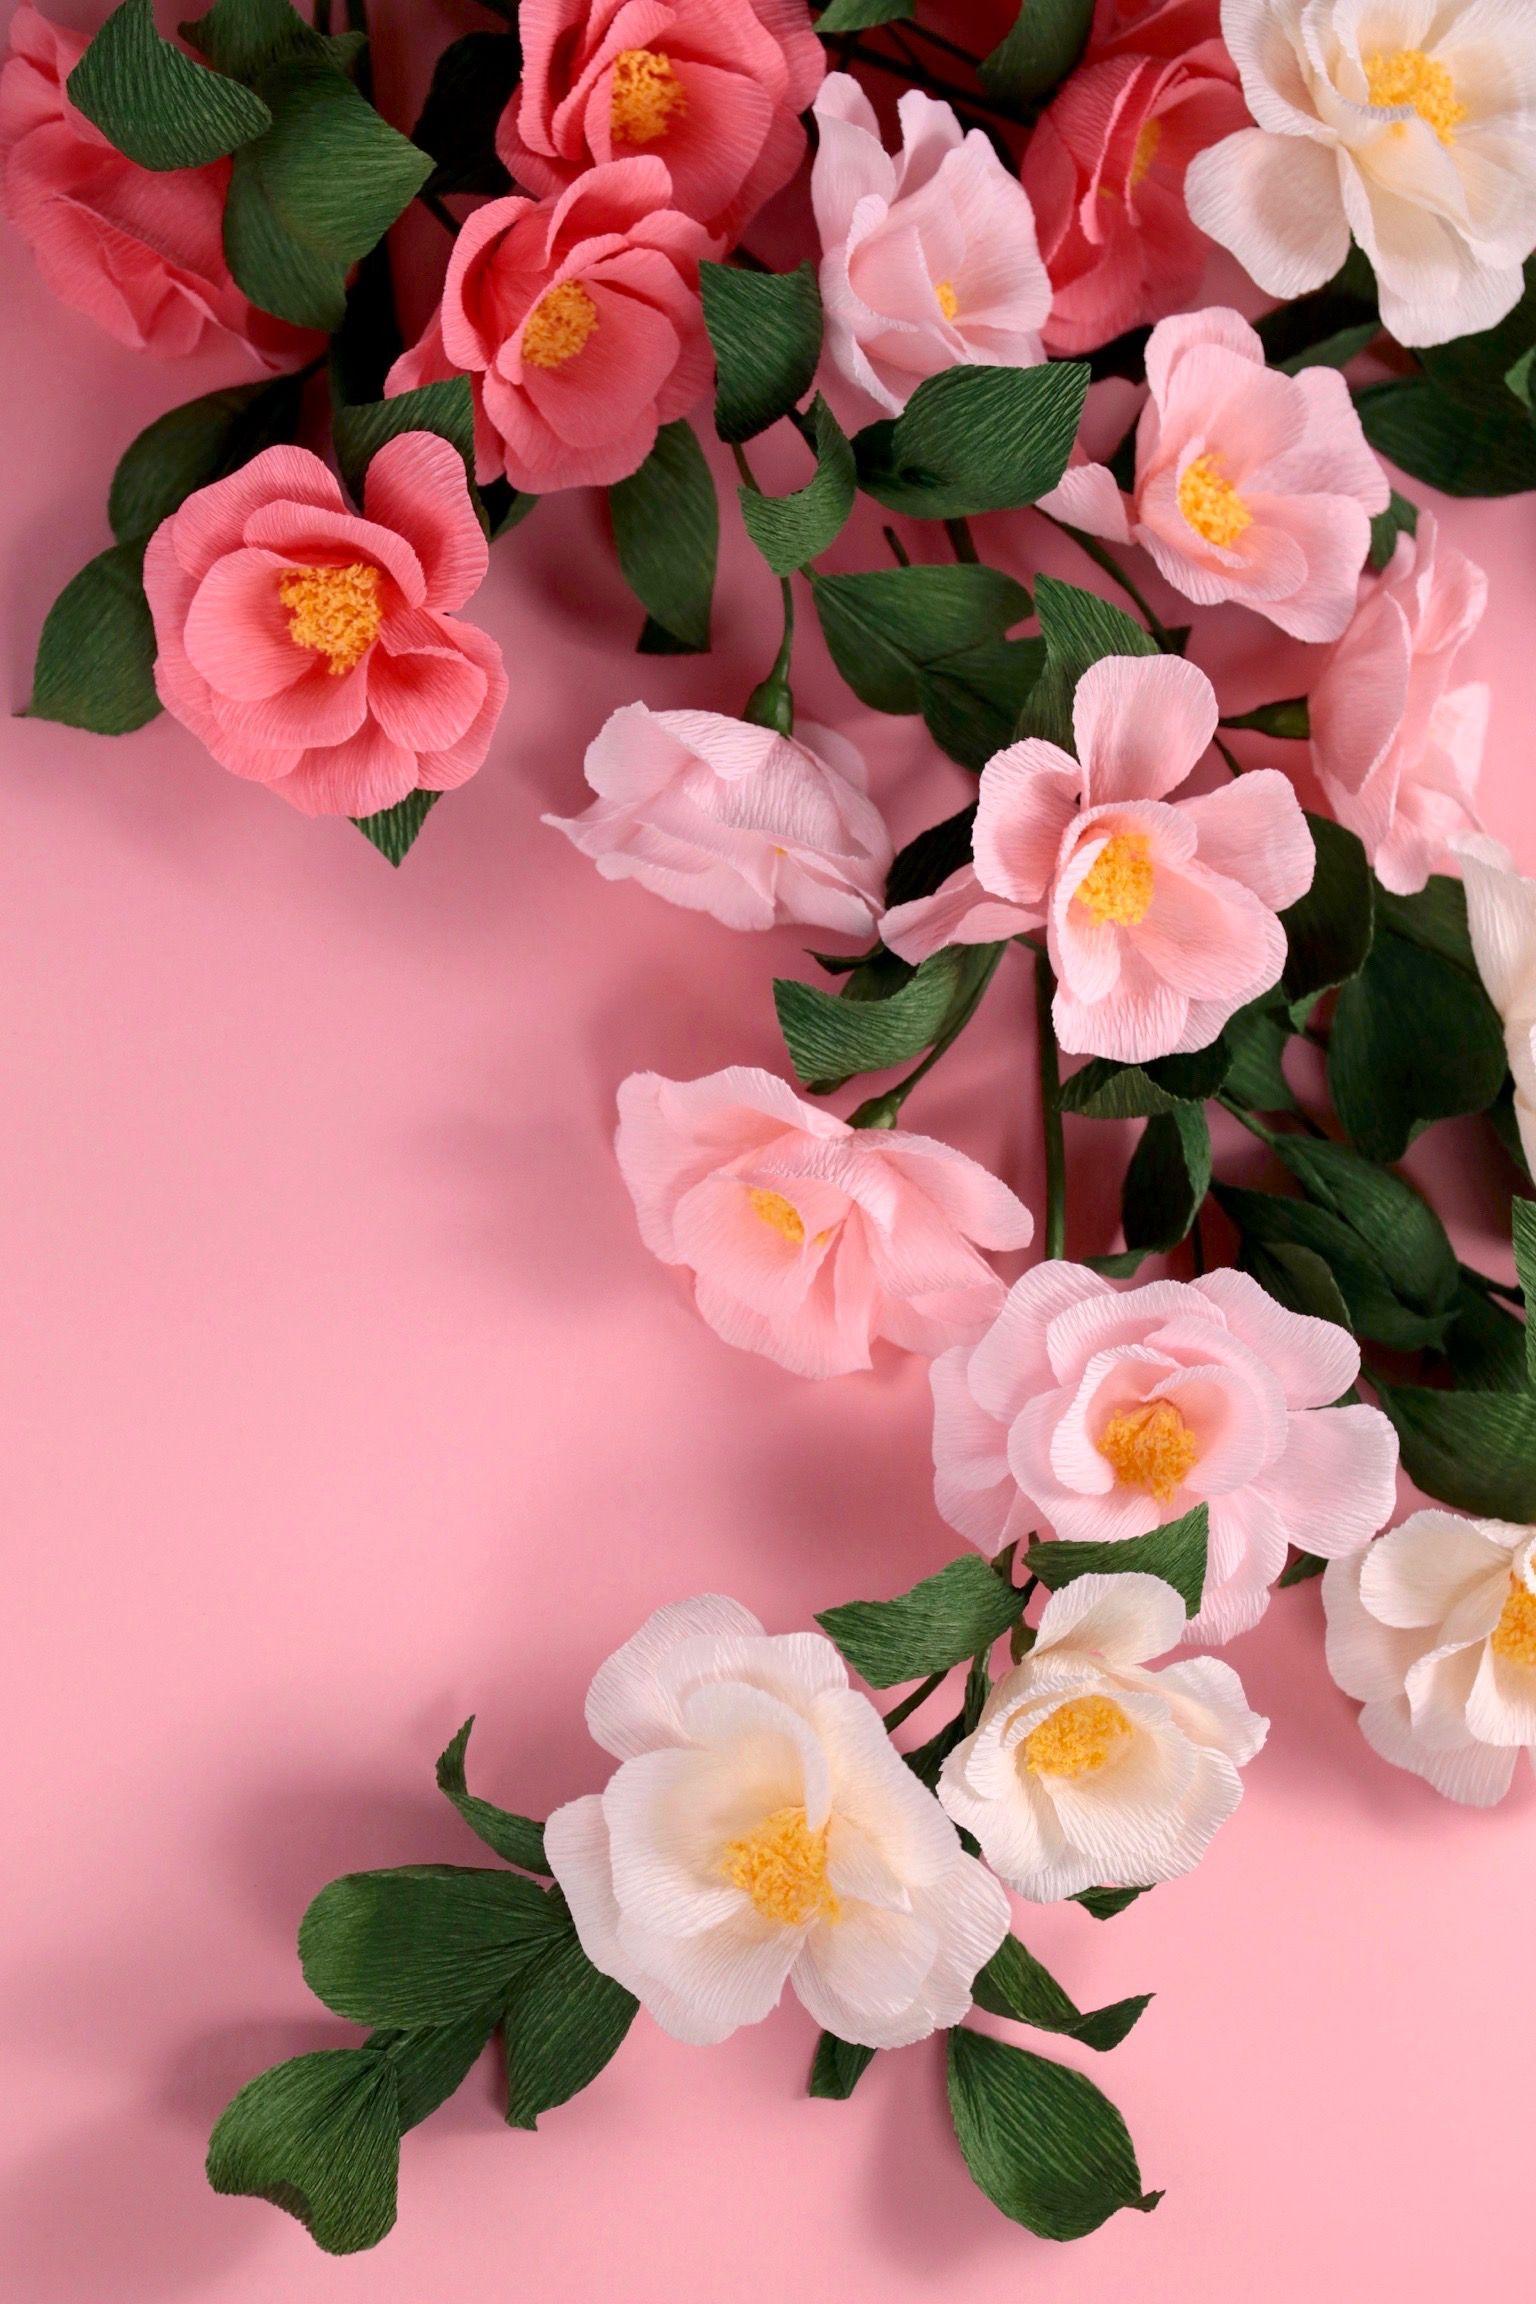 Diy Paper Camellia With Jennifer Tran Pinterest Camellia Diy